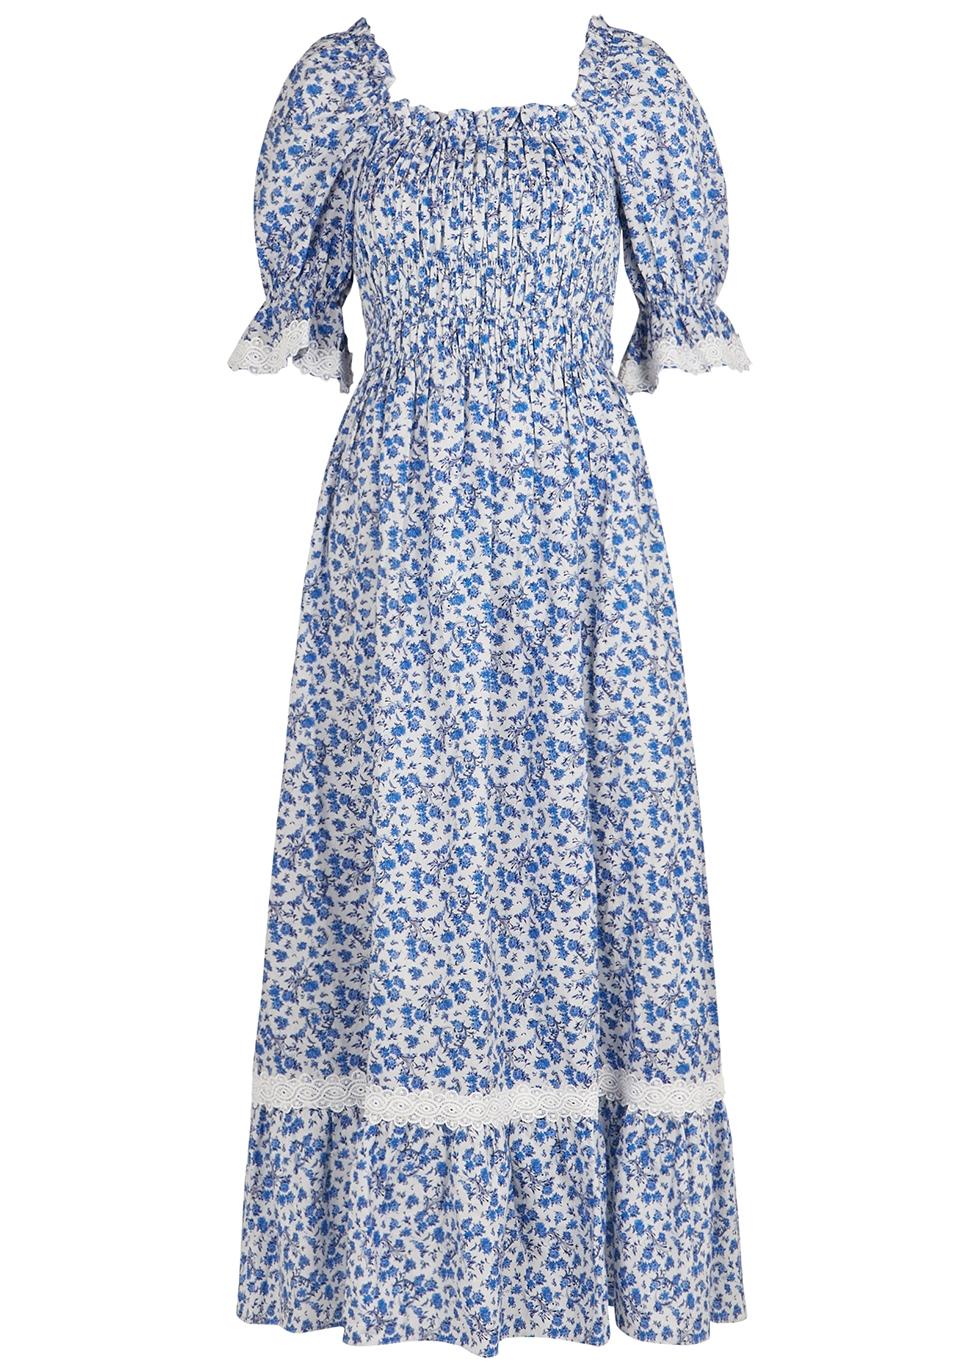 Elisa floral-print cotton-blend dress